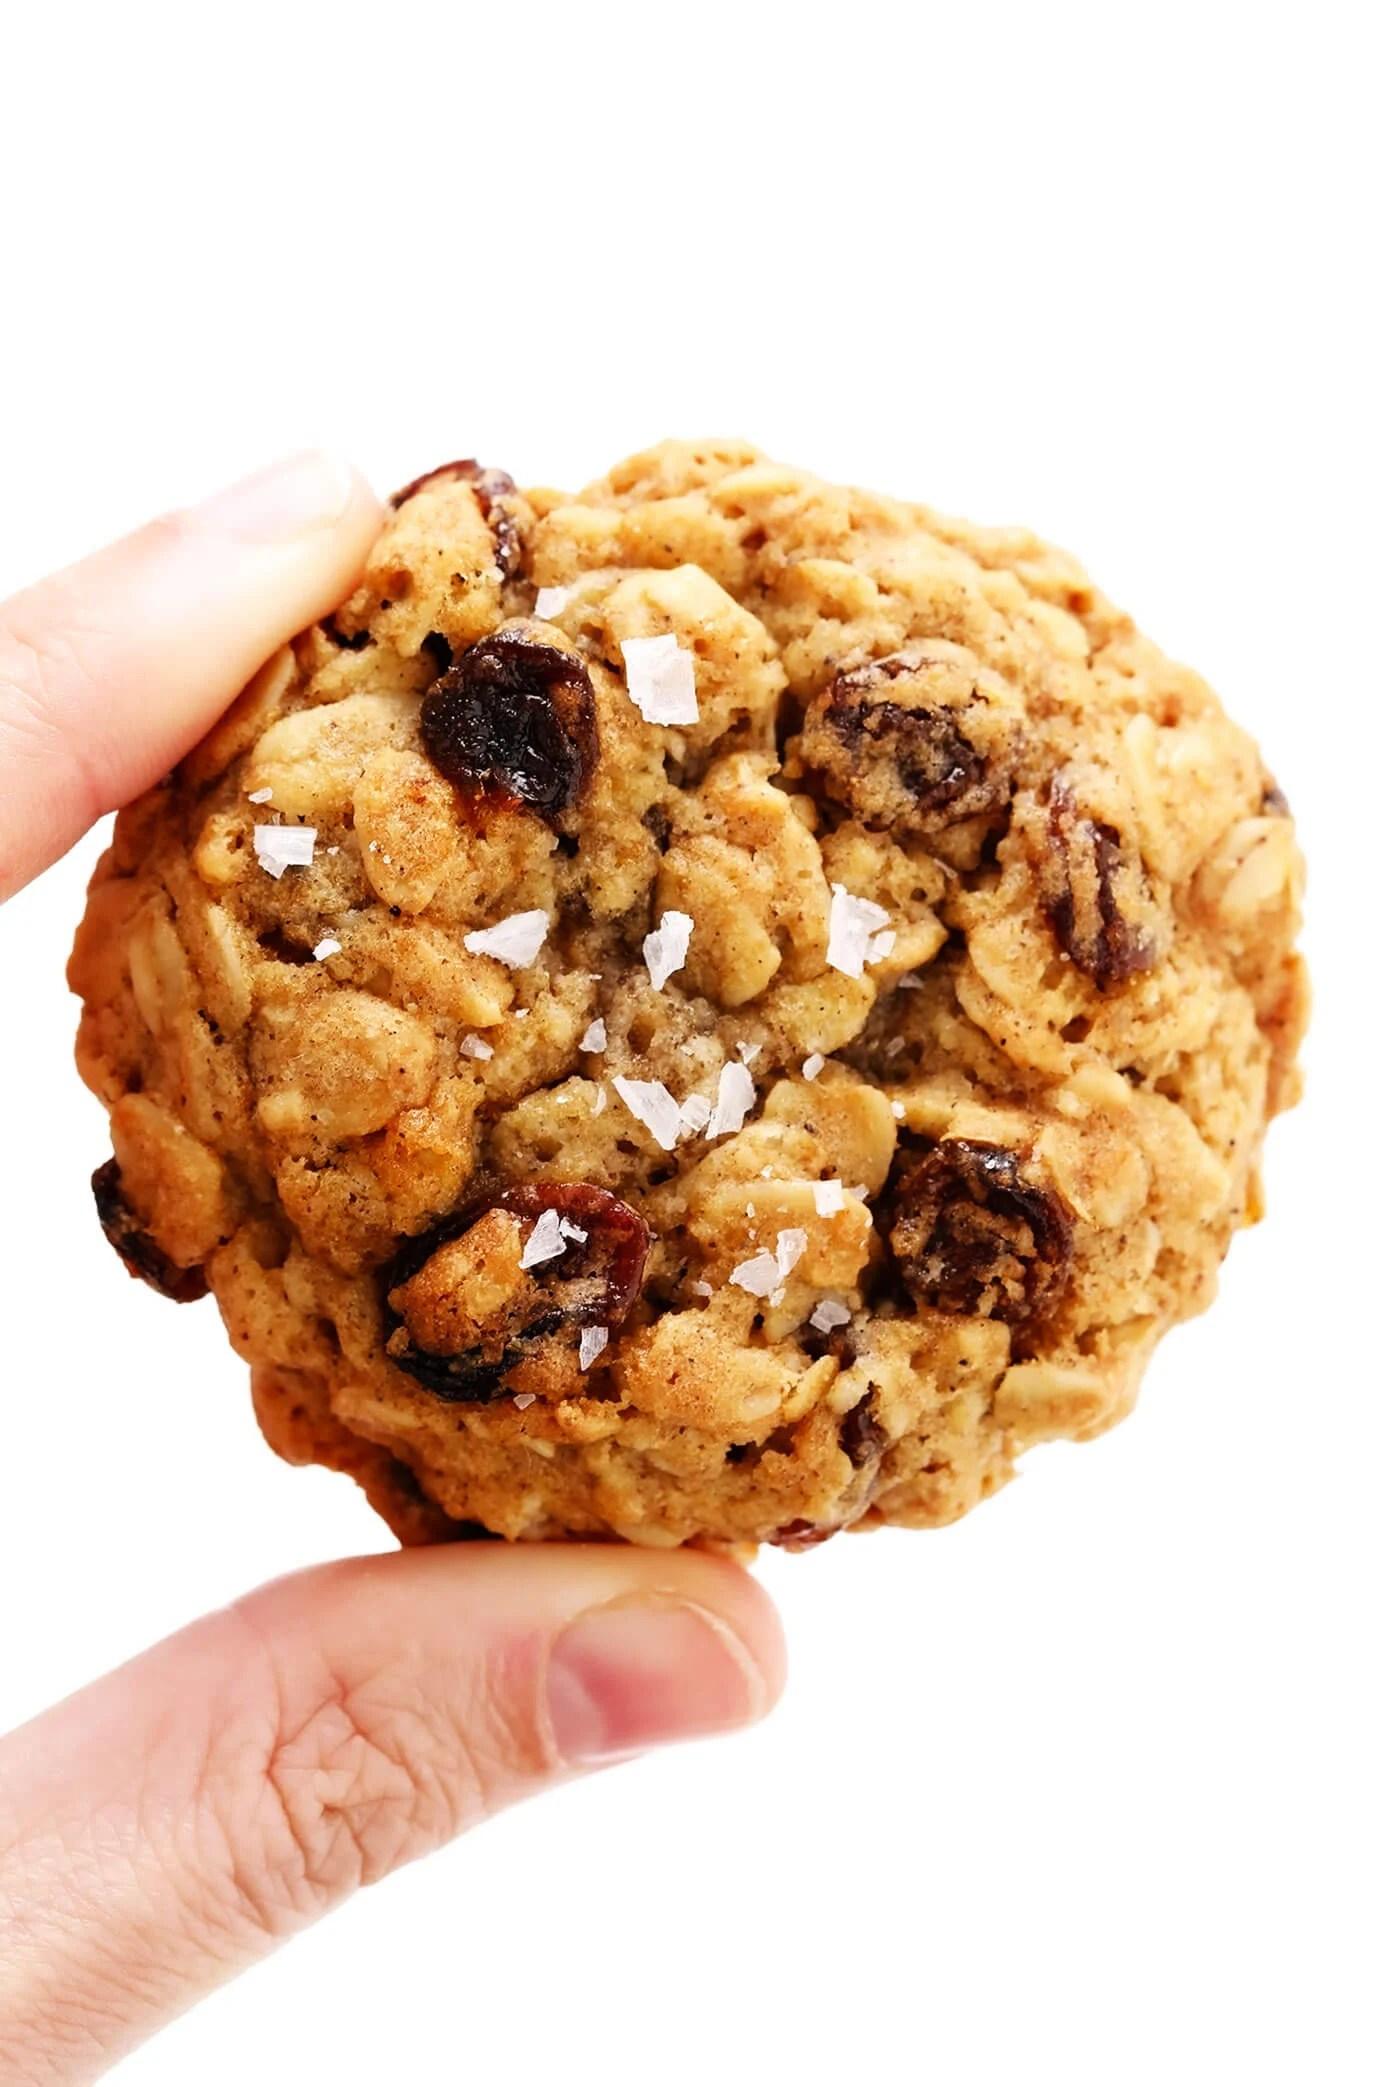 Oatmeal Raisin Cookie Closeup